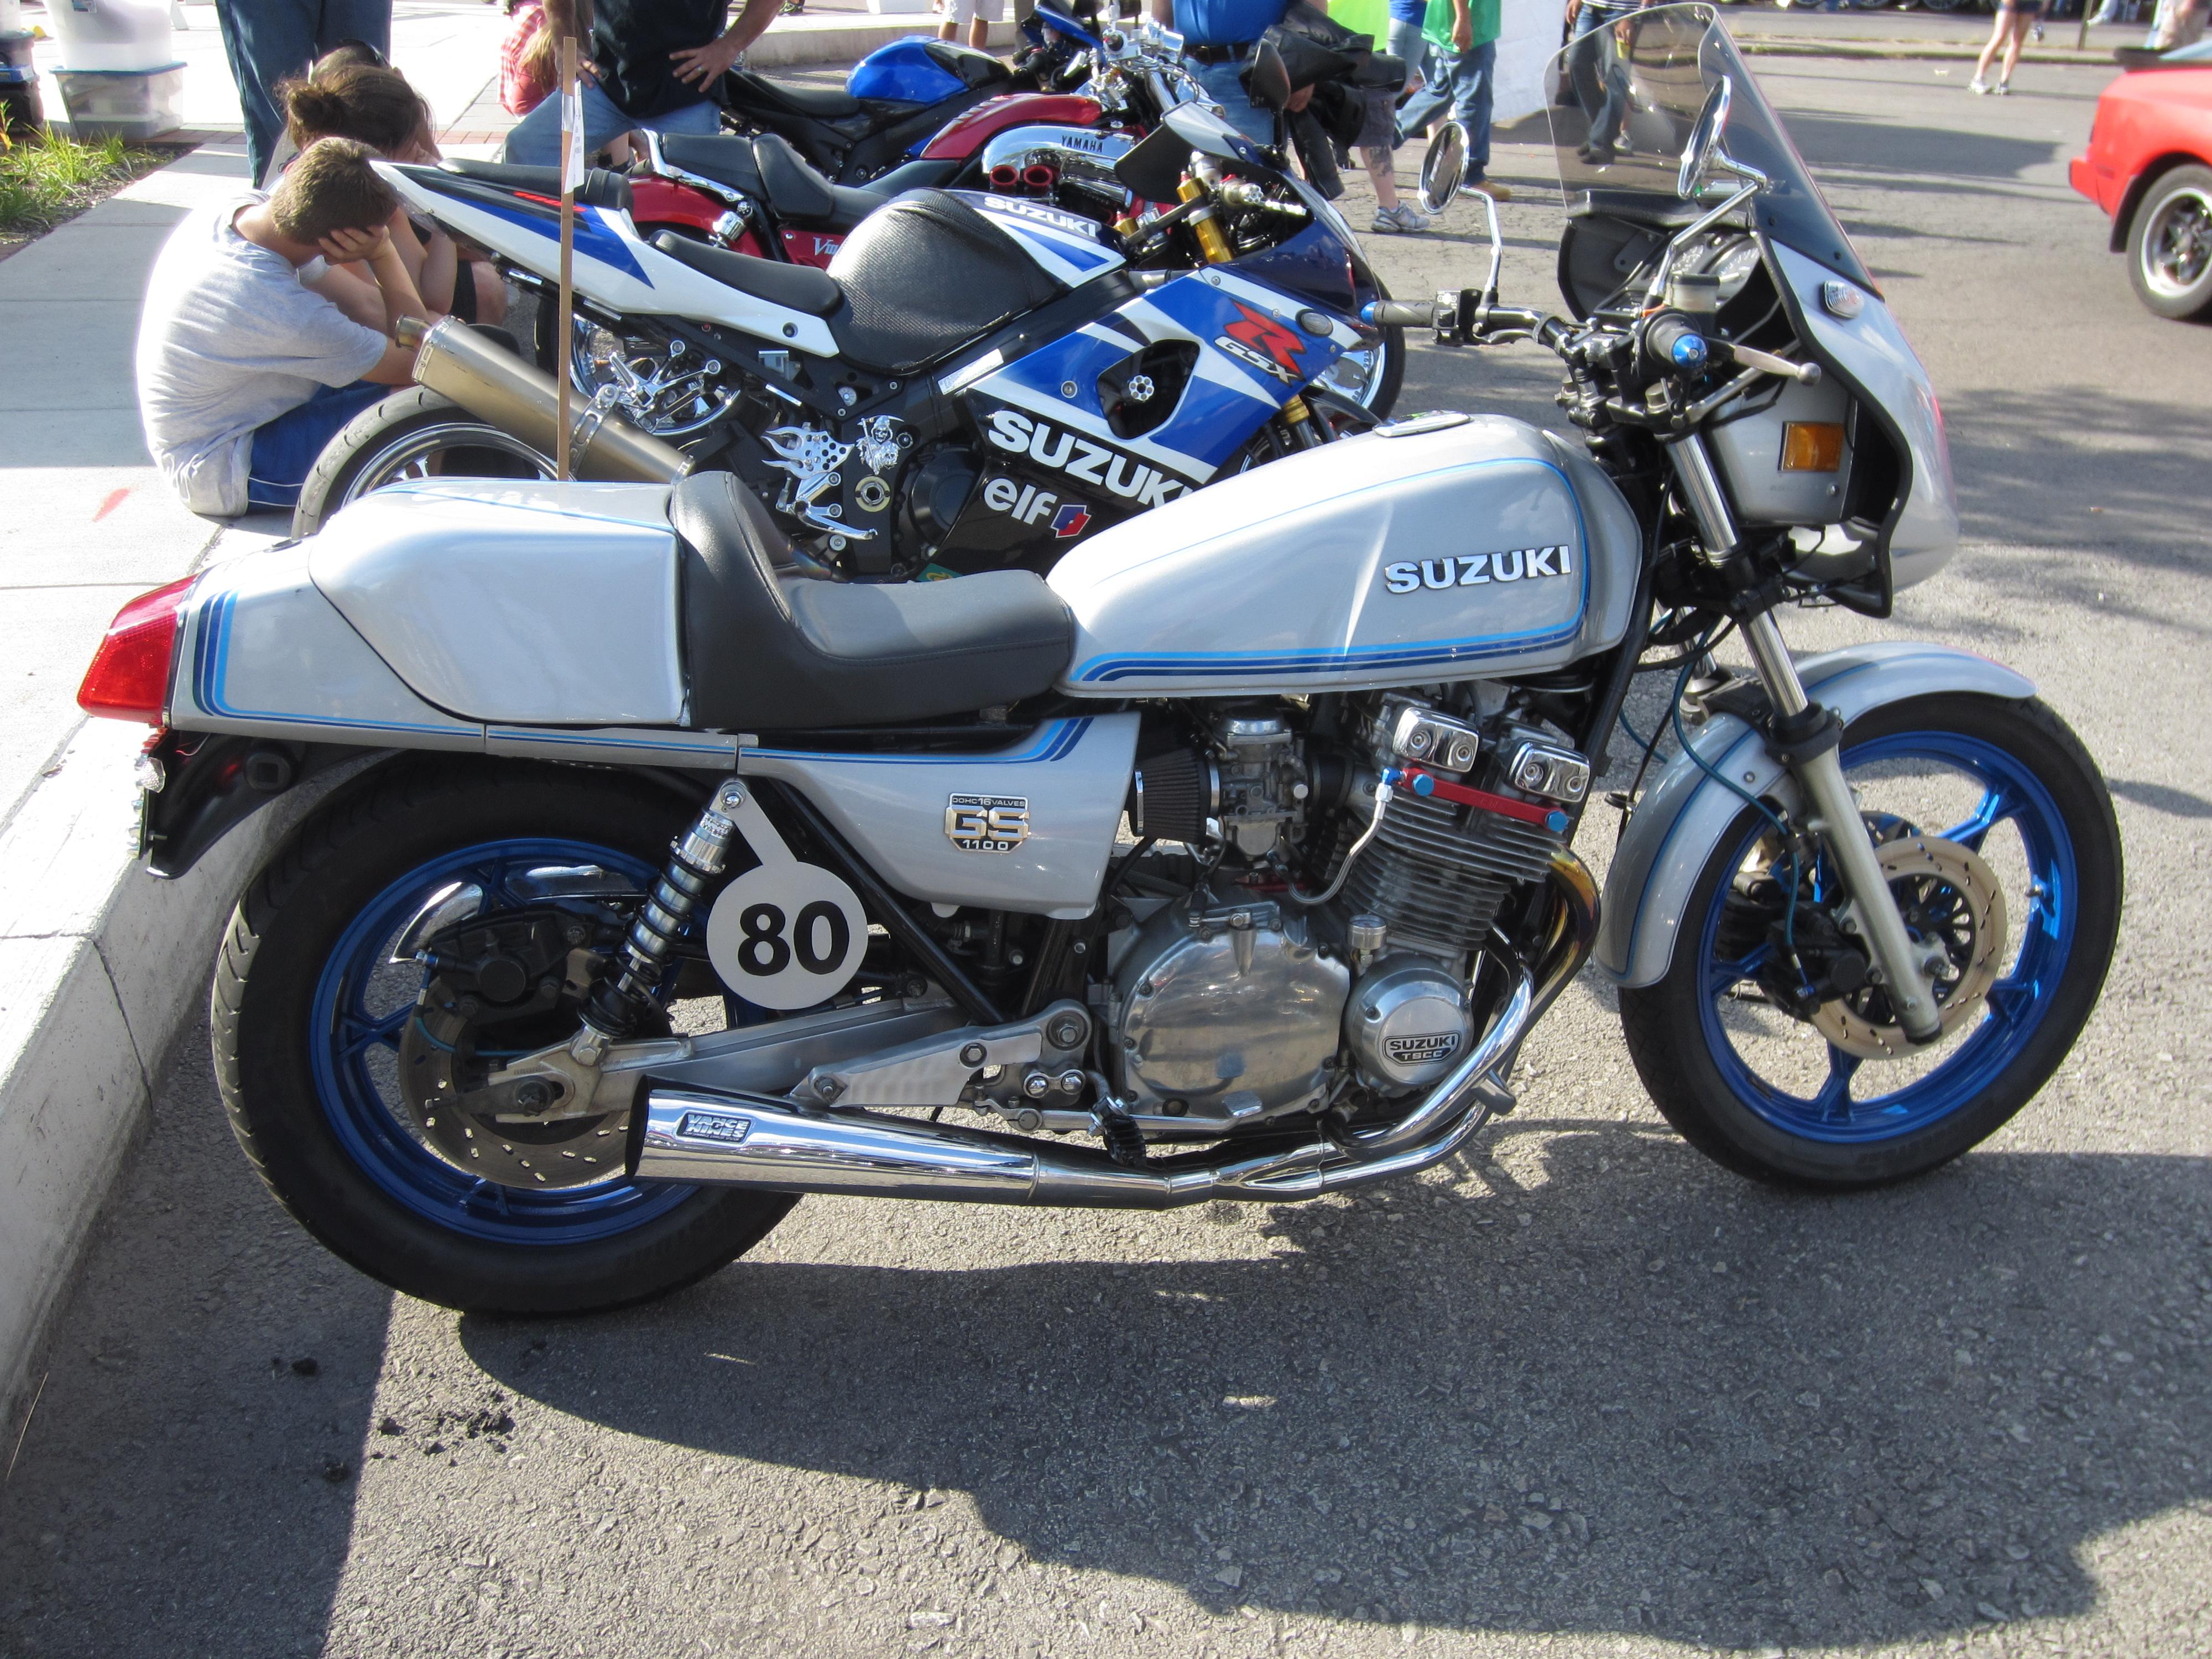 1980 Suzuki GS1100 | No Baffles